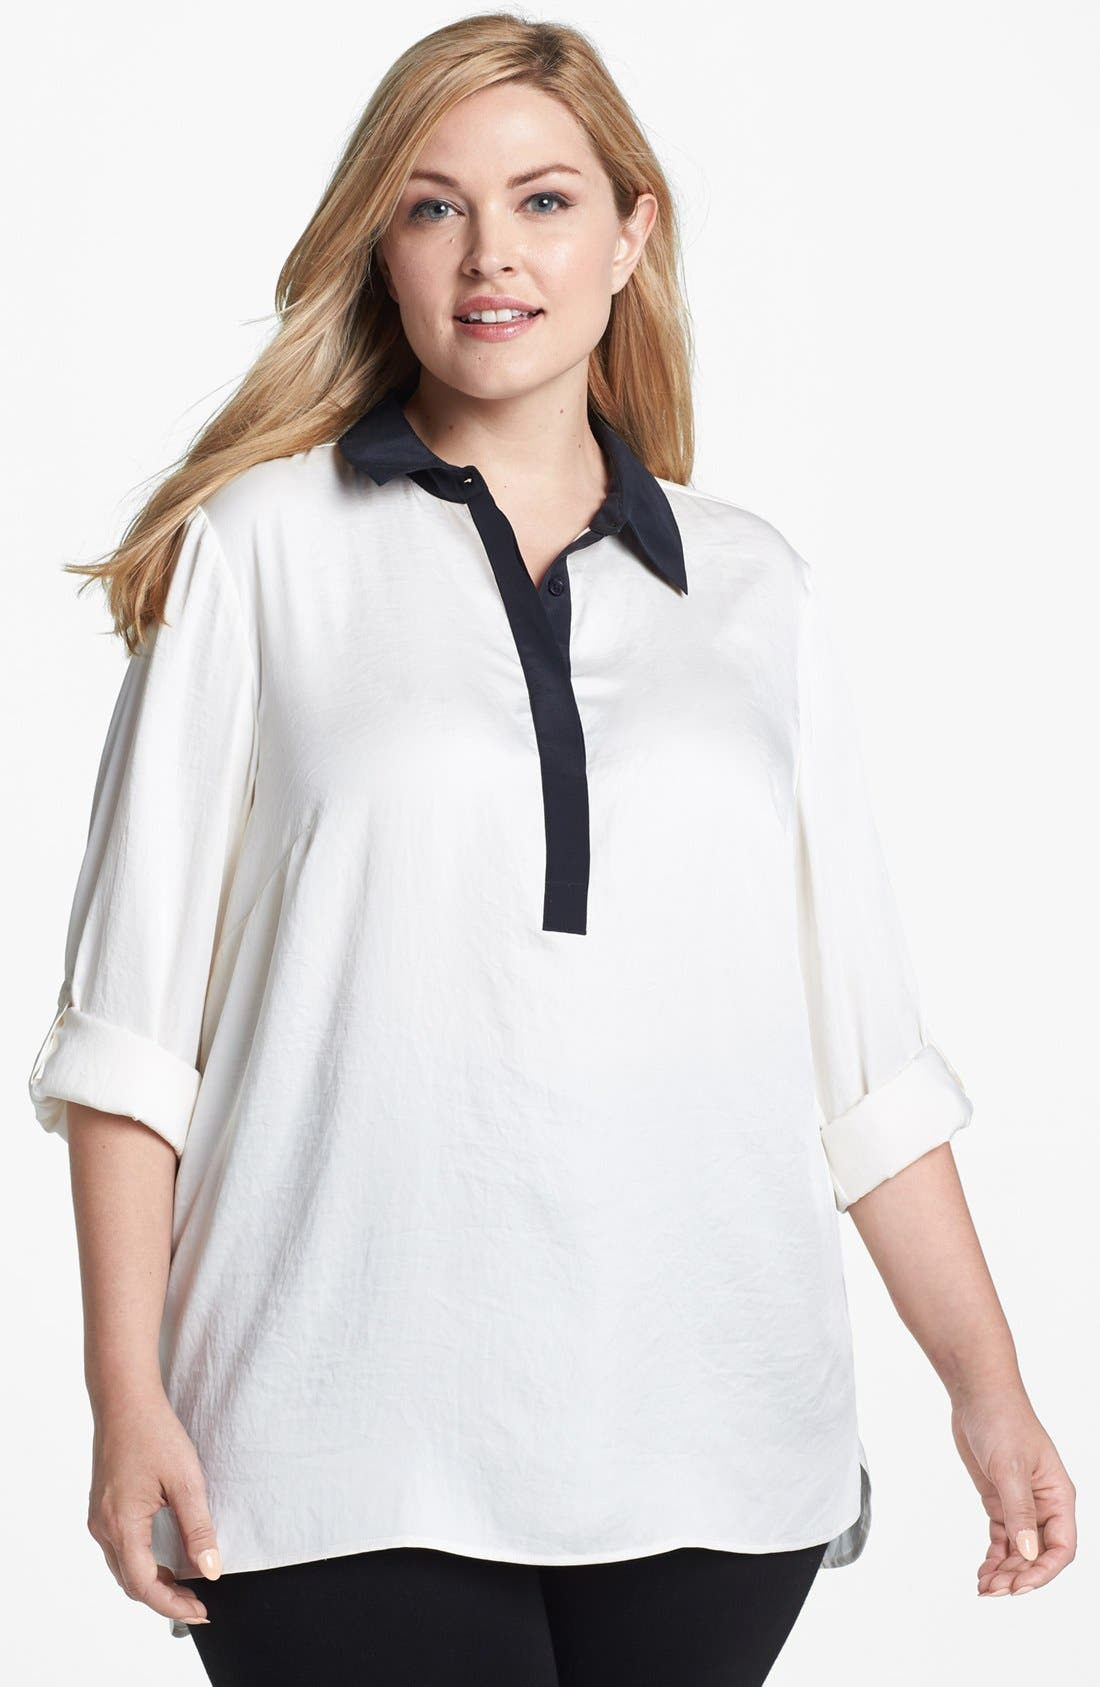 Alternate Image 1 Selected - MICHAEL Michael Kors Contrast Trim Tunic Shirt (Plus Size)